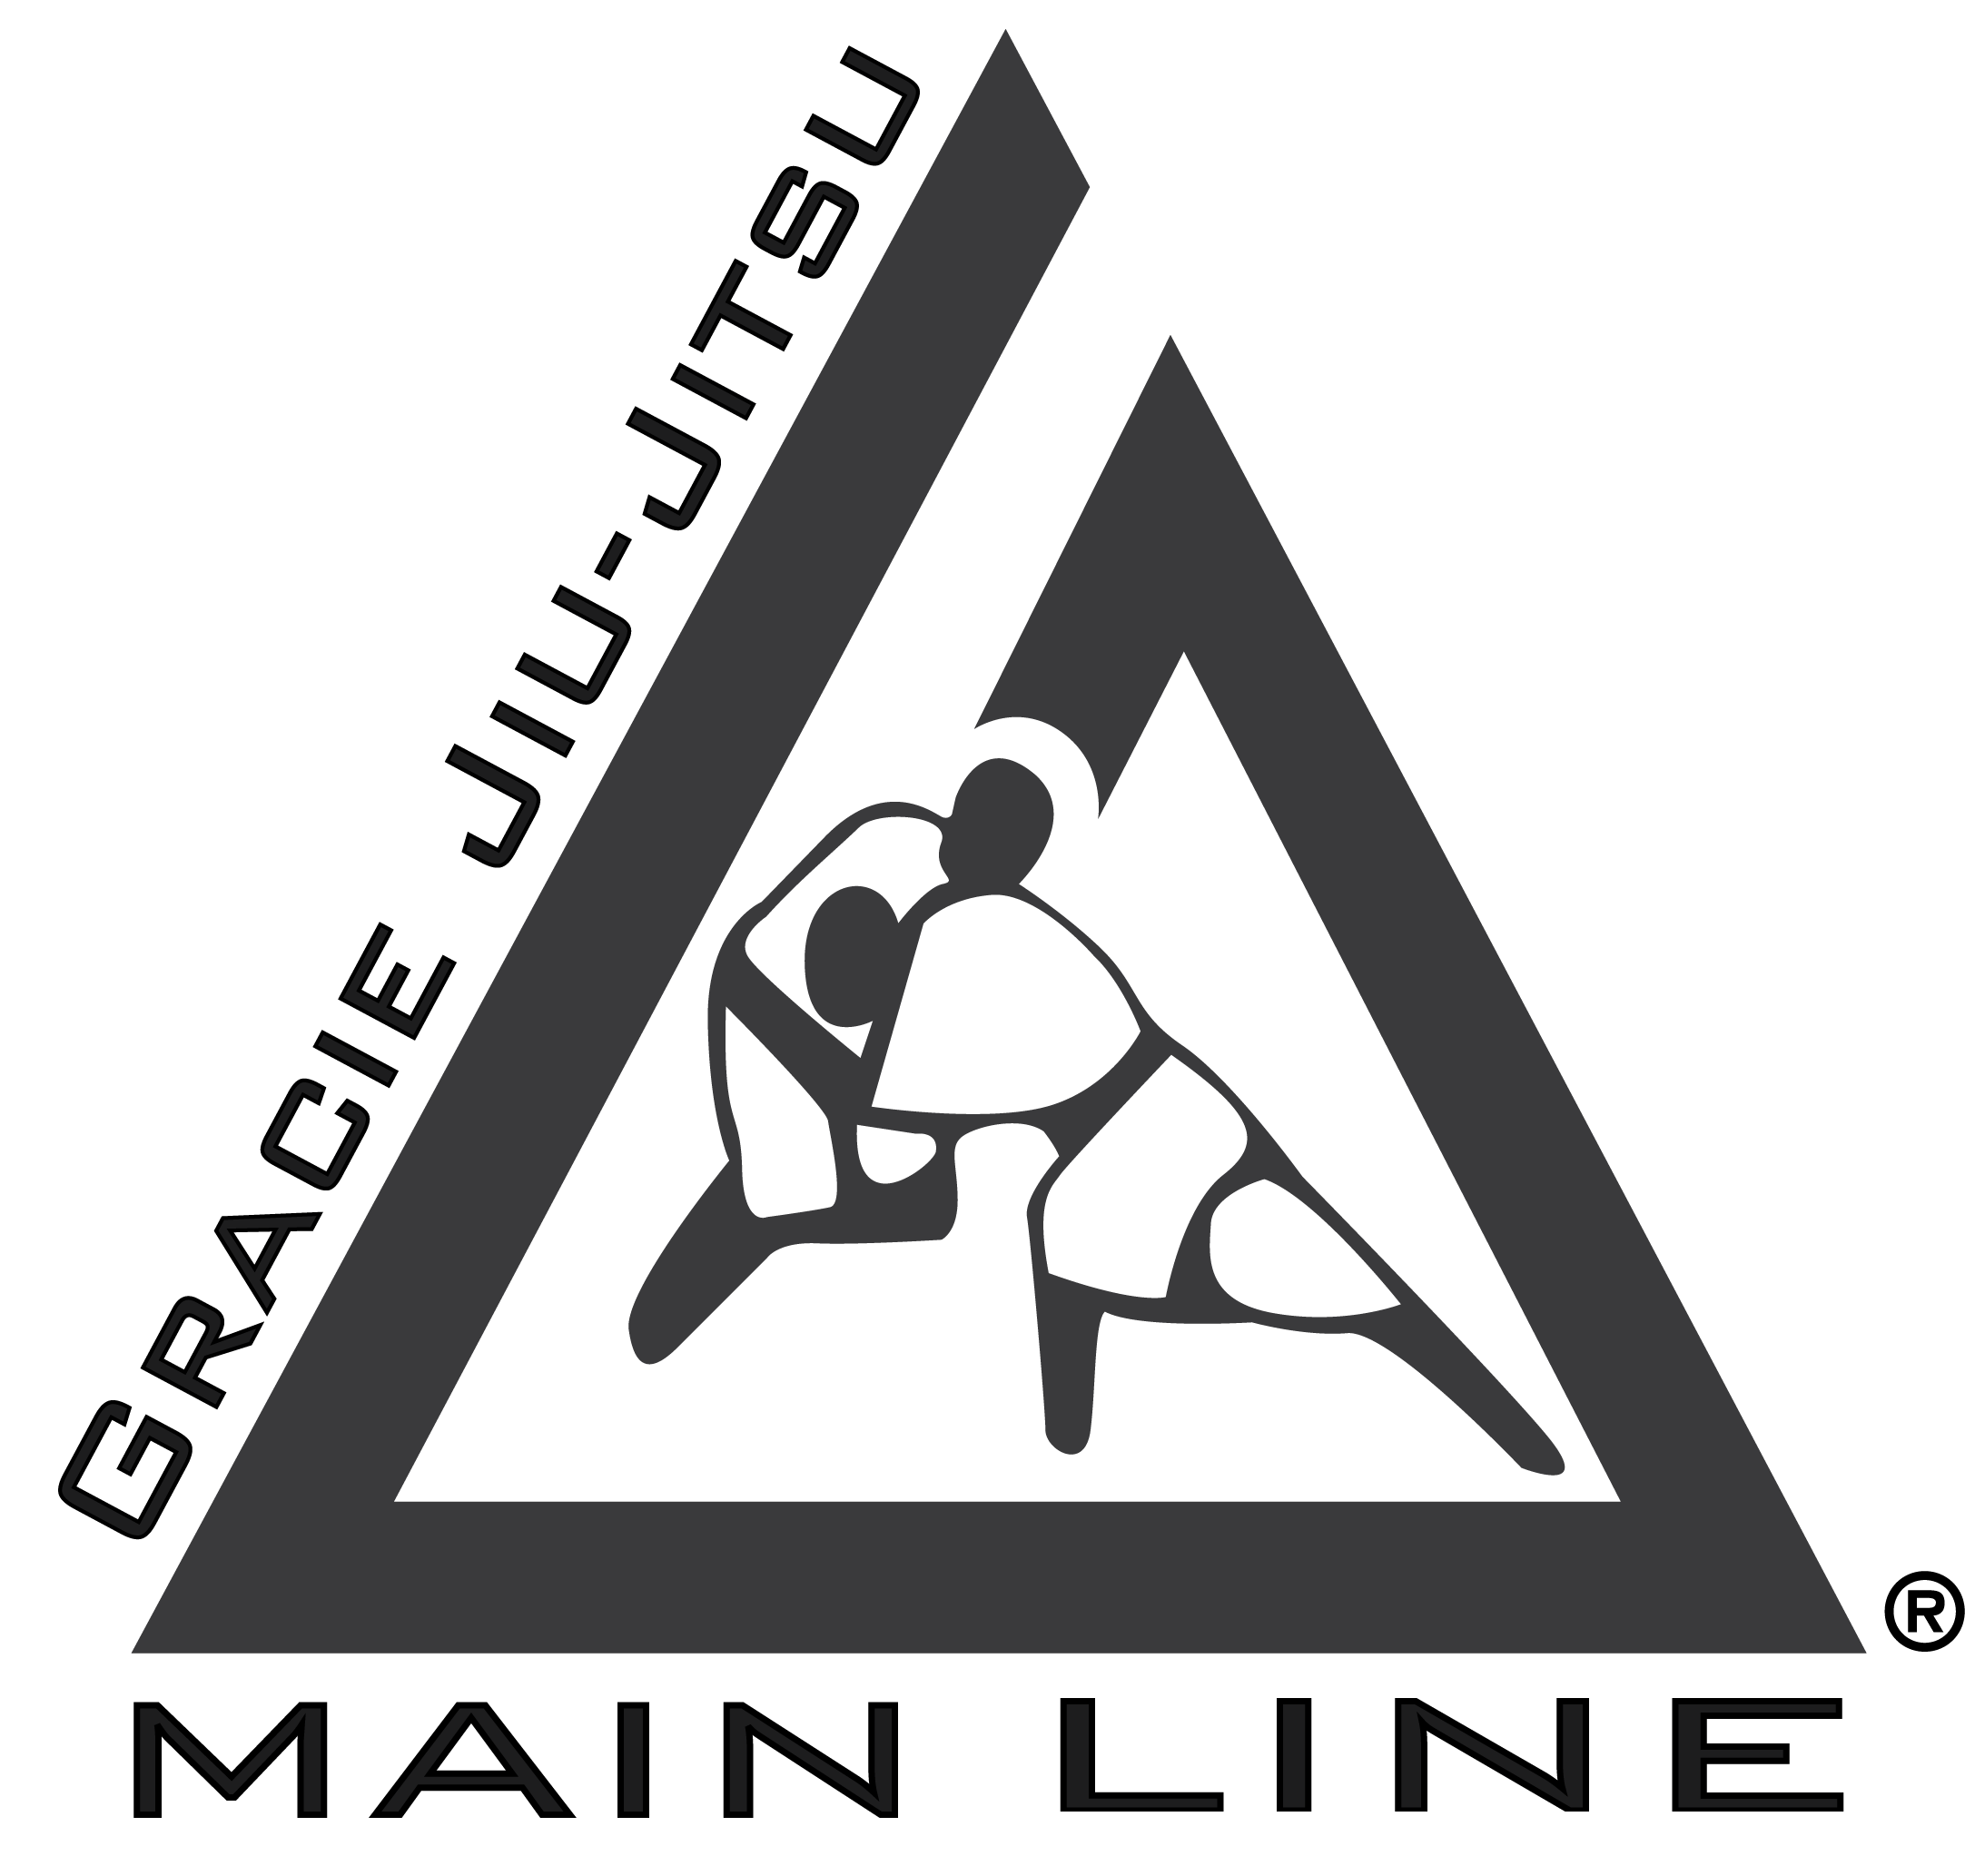 jujitsu logo gallery